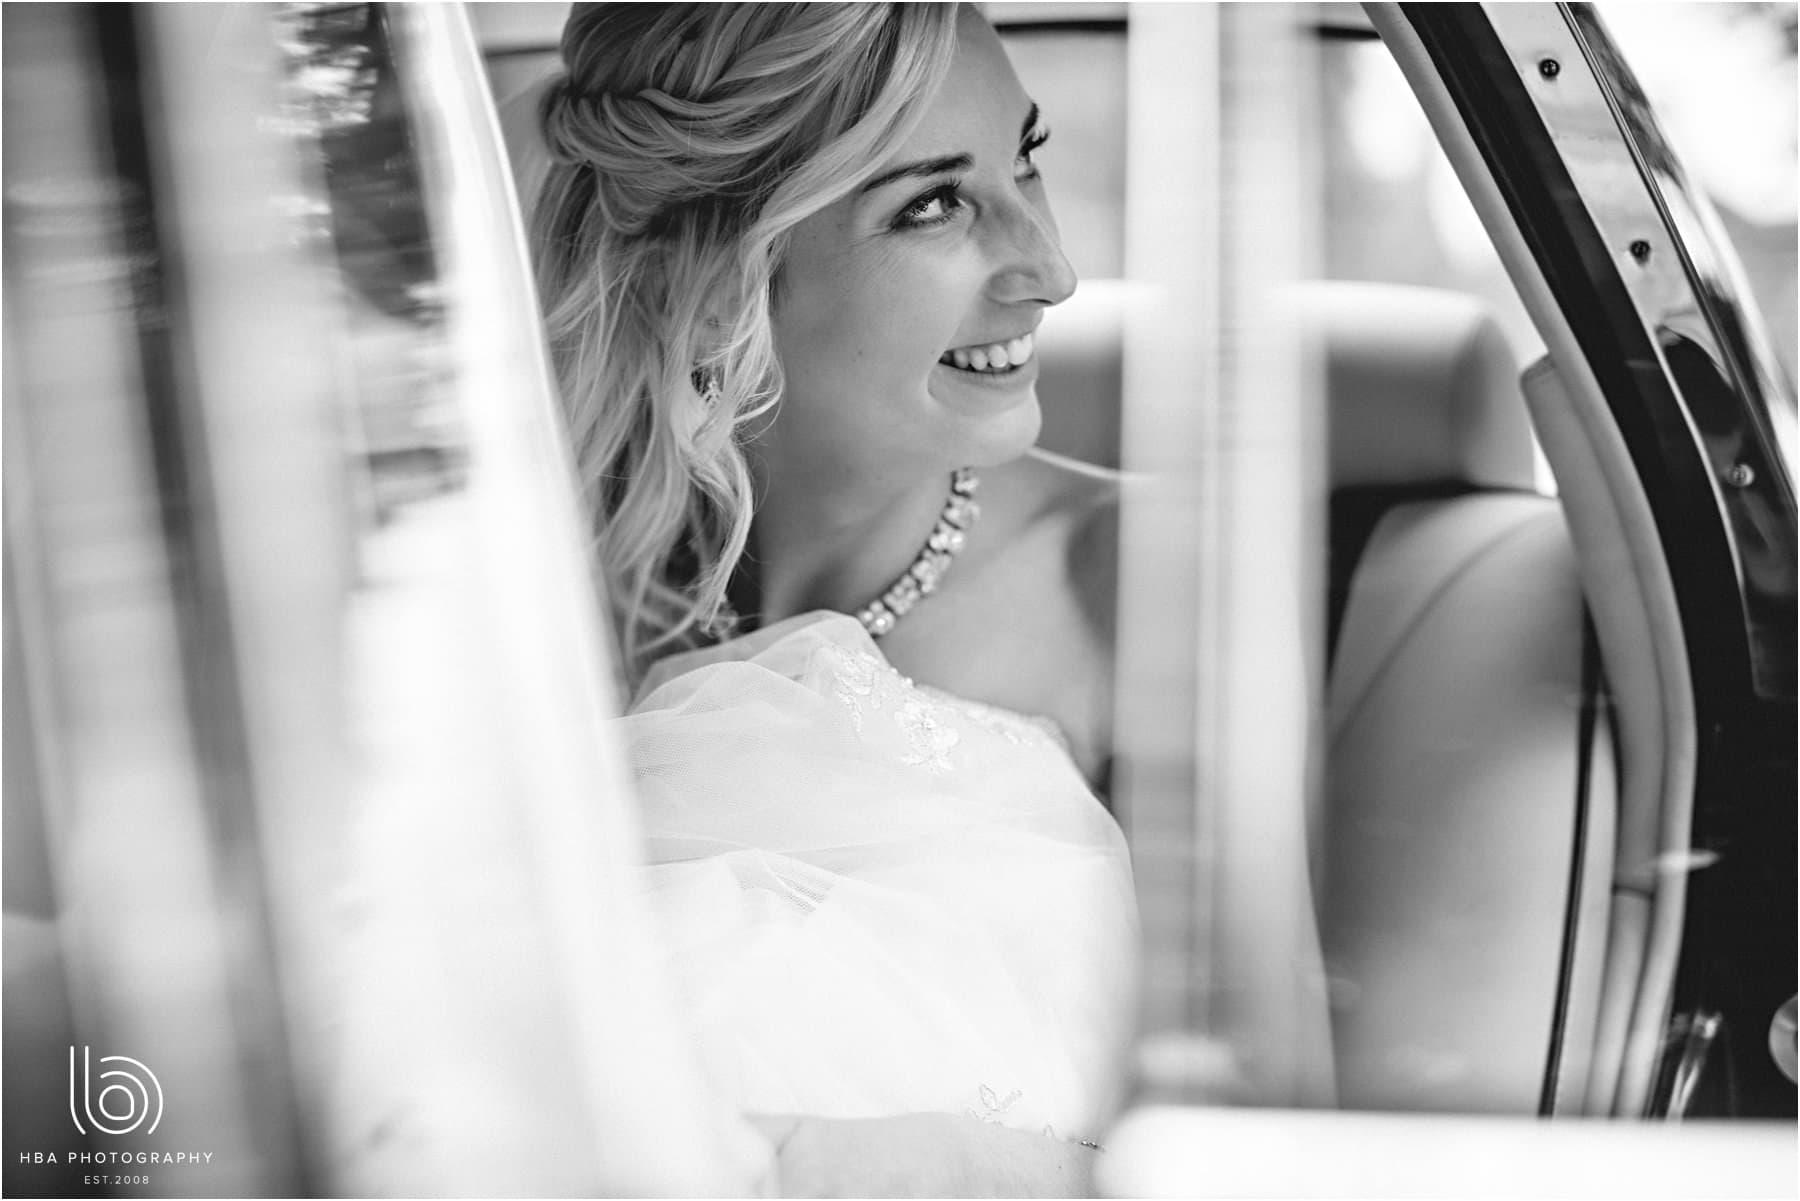 the bride in the wedding car